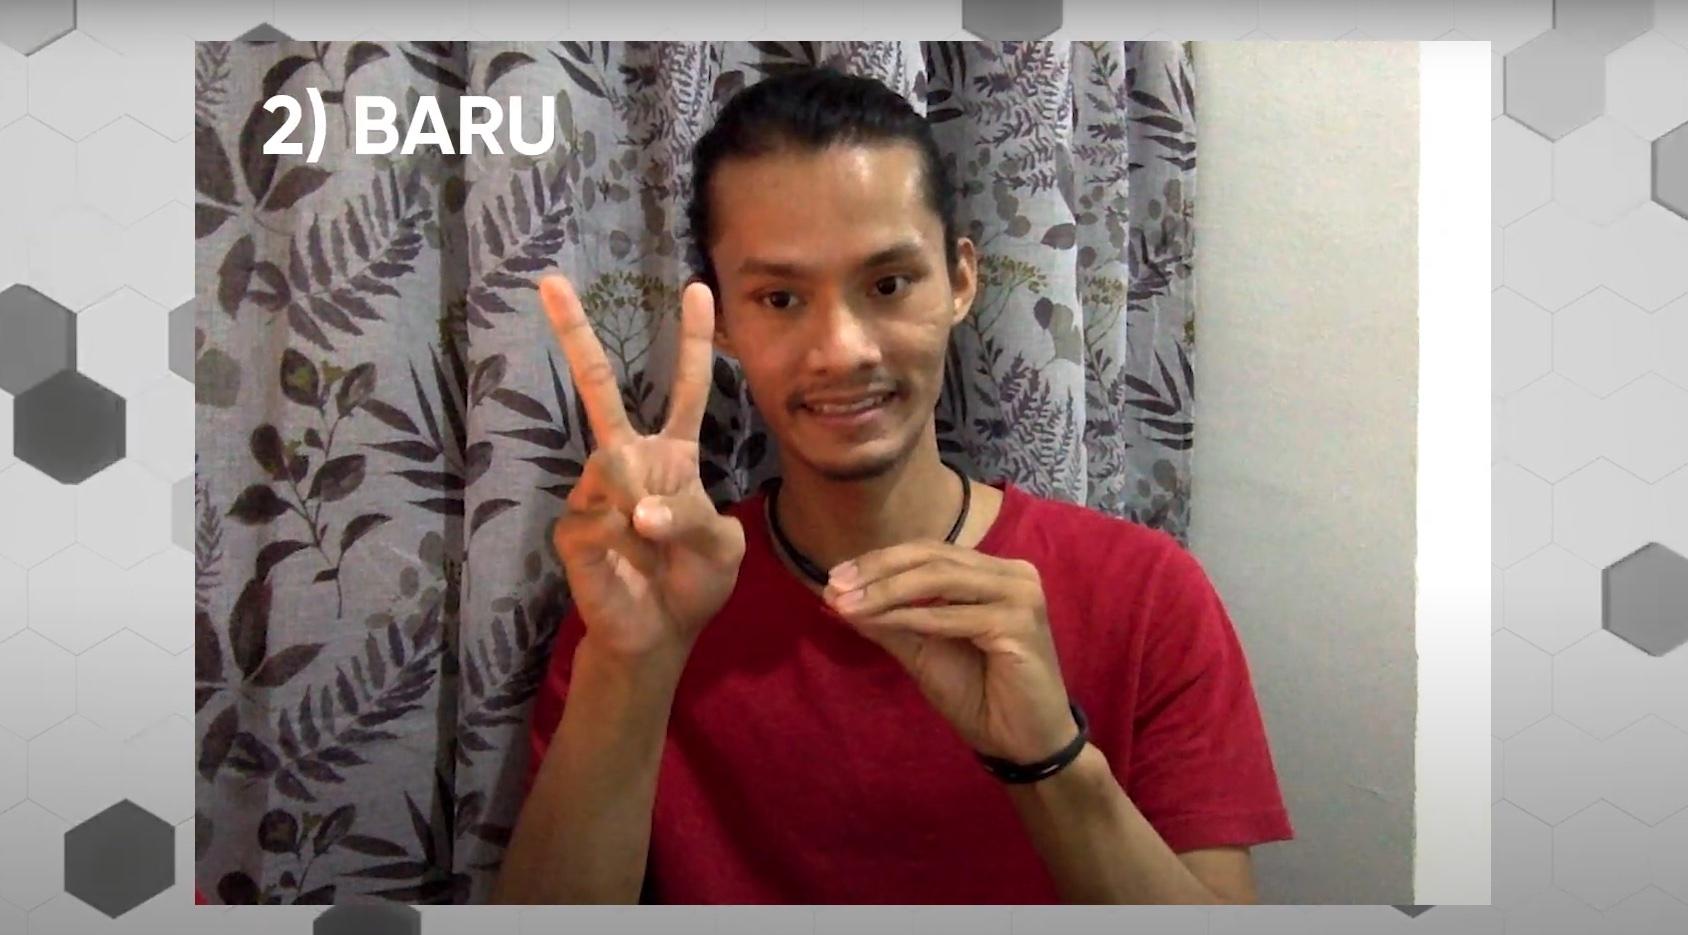 Jom kita belajar (Bahasa Isyarat Malaysia)